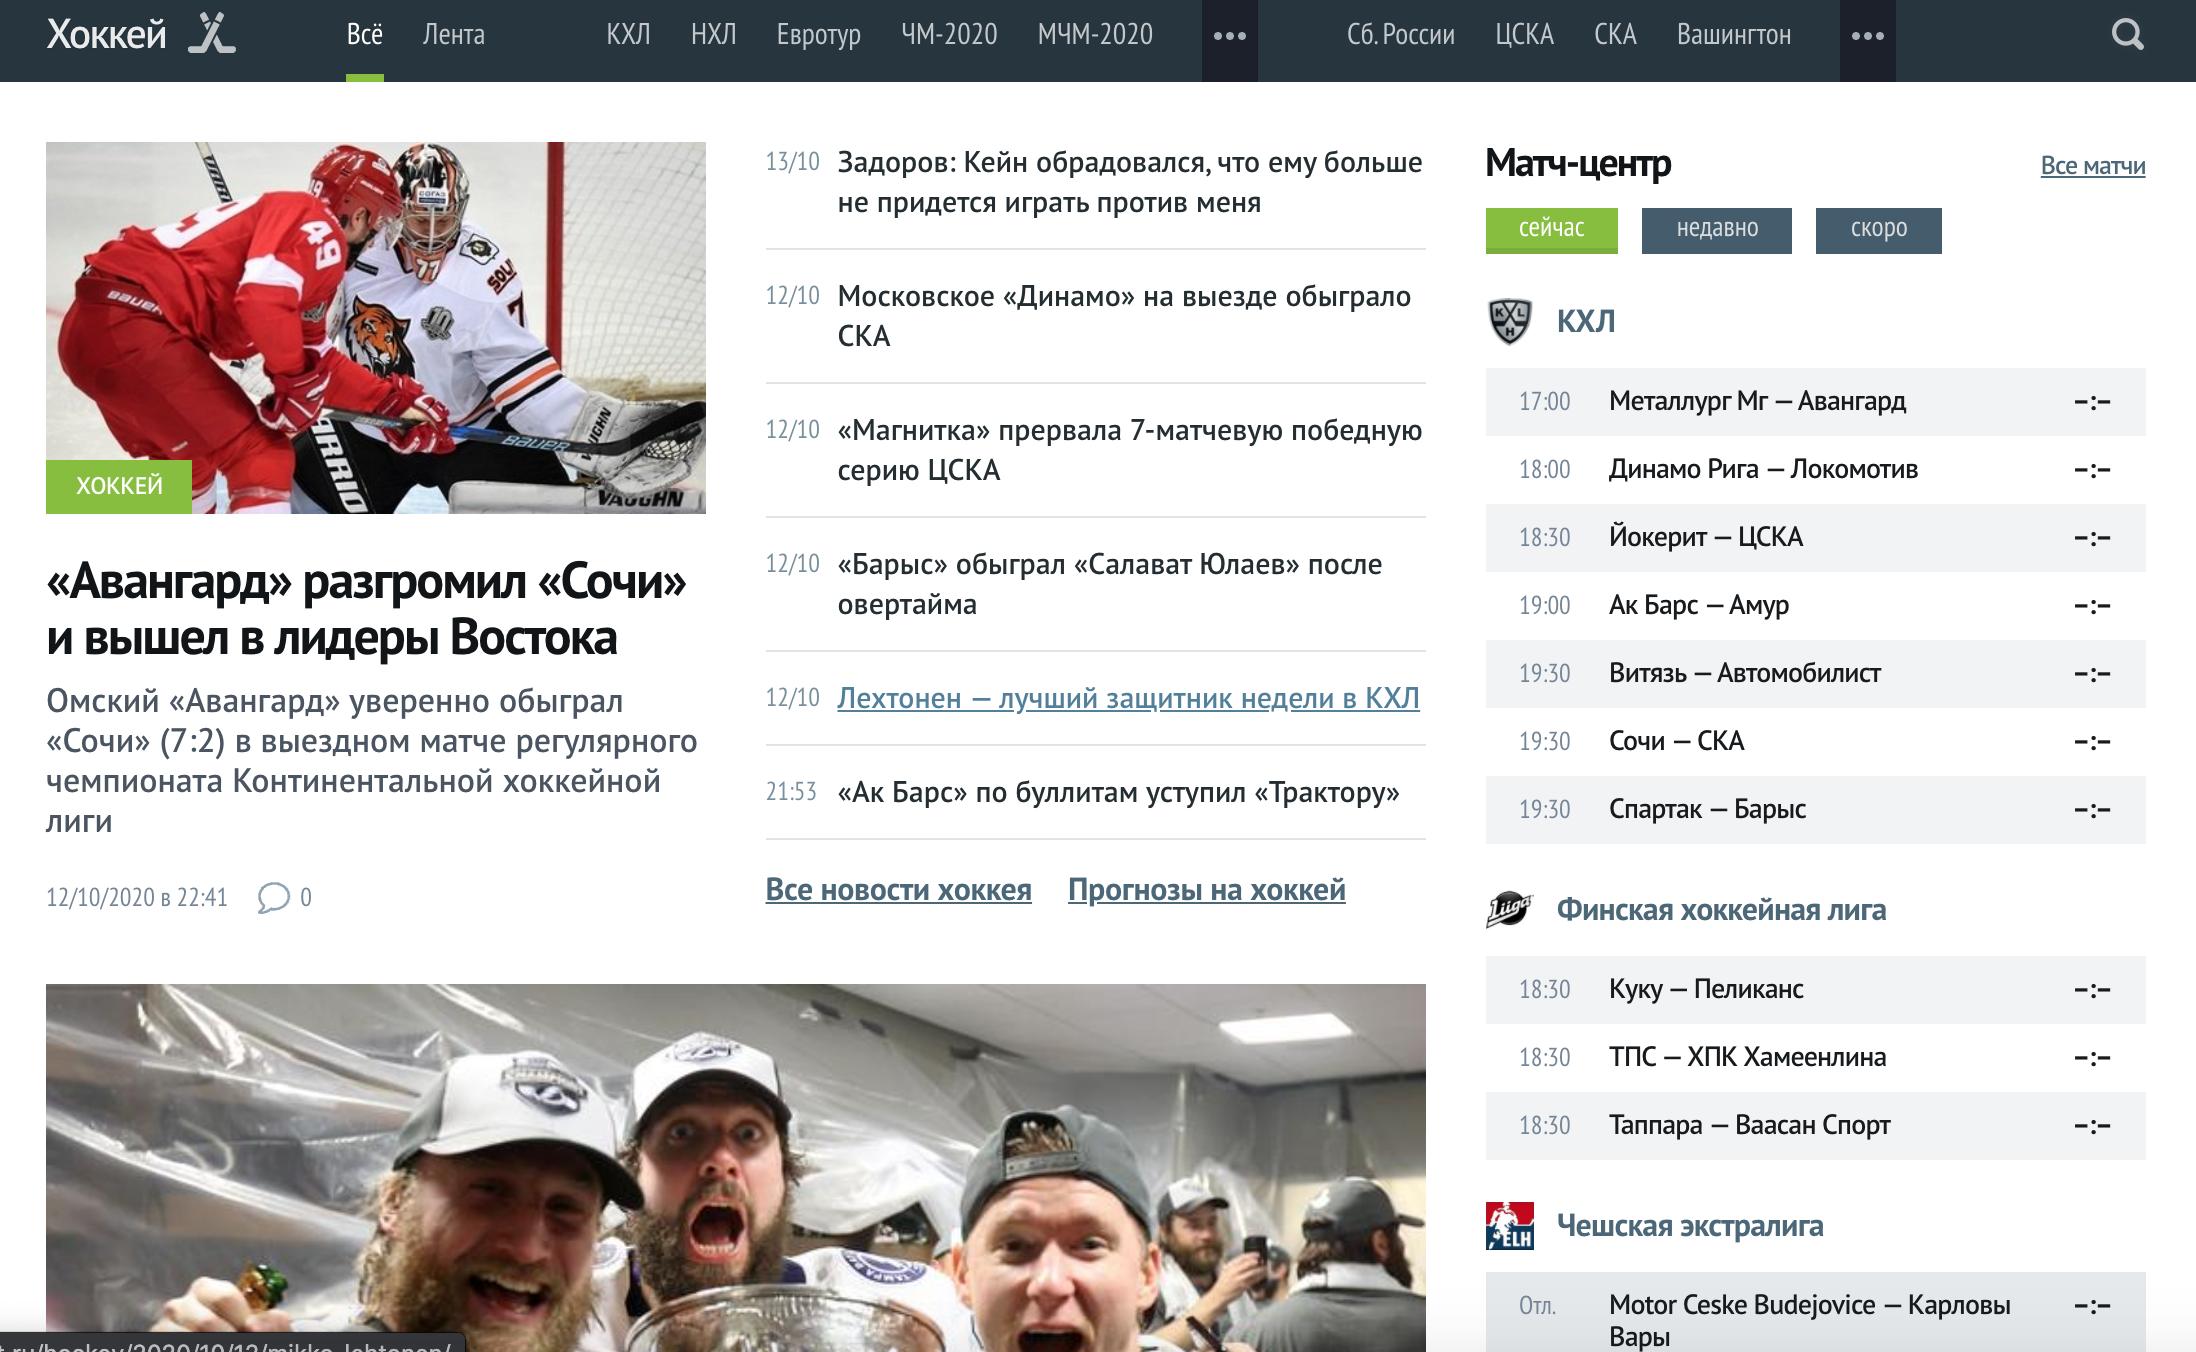 Страница о хоккее Livesport (Лайфспорт)